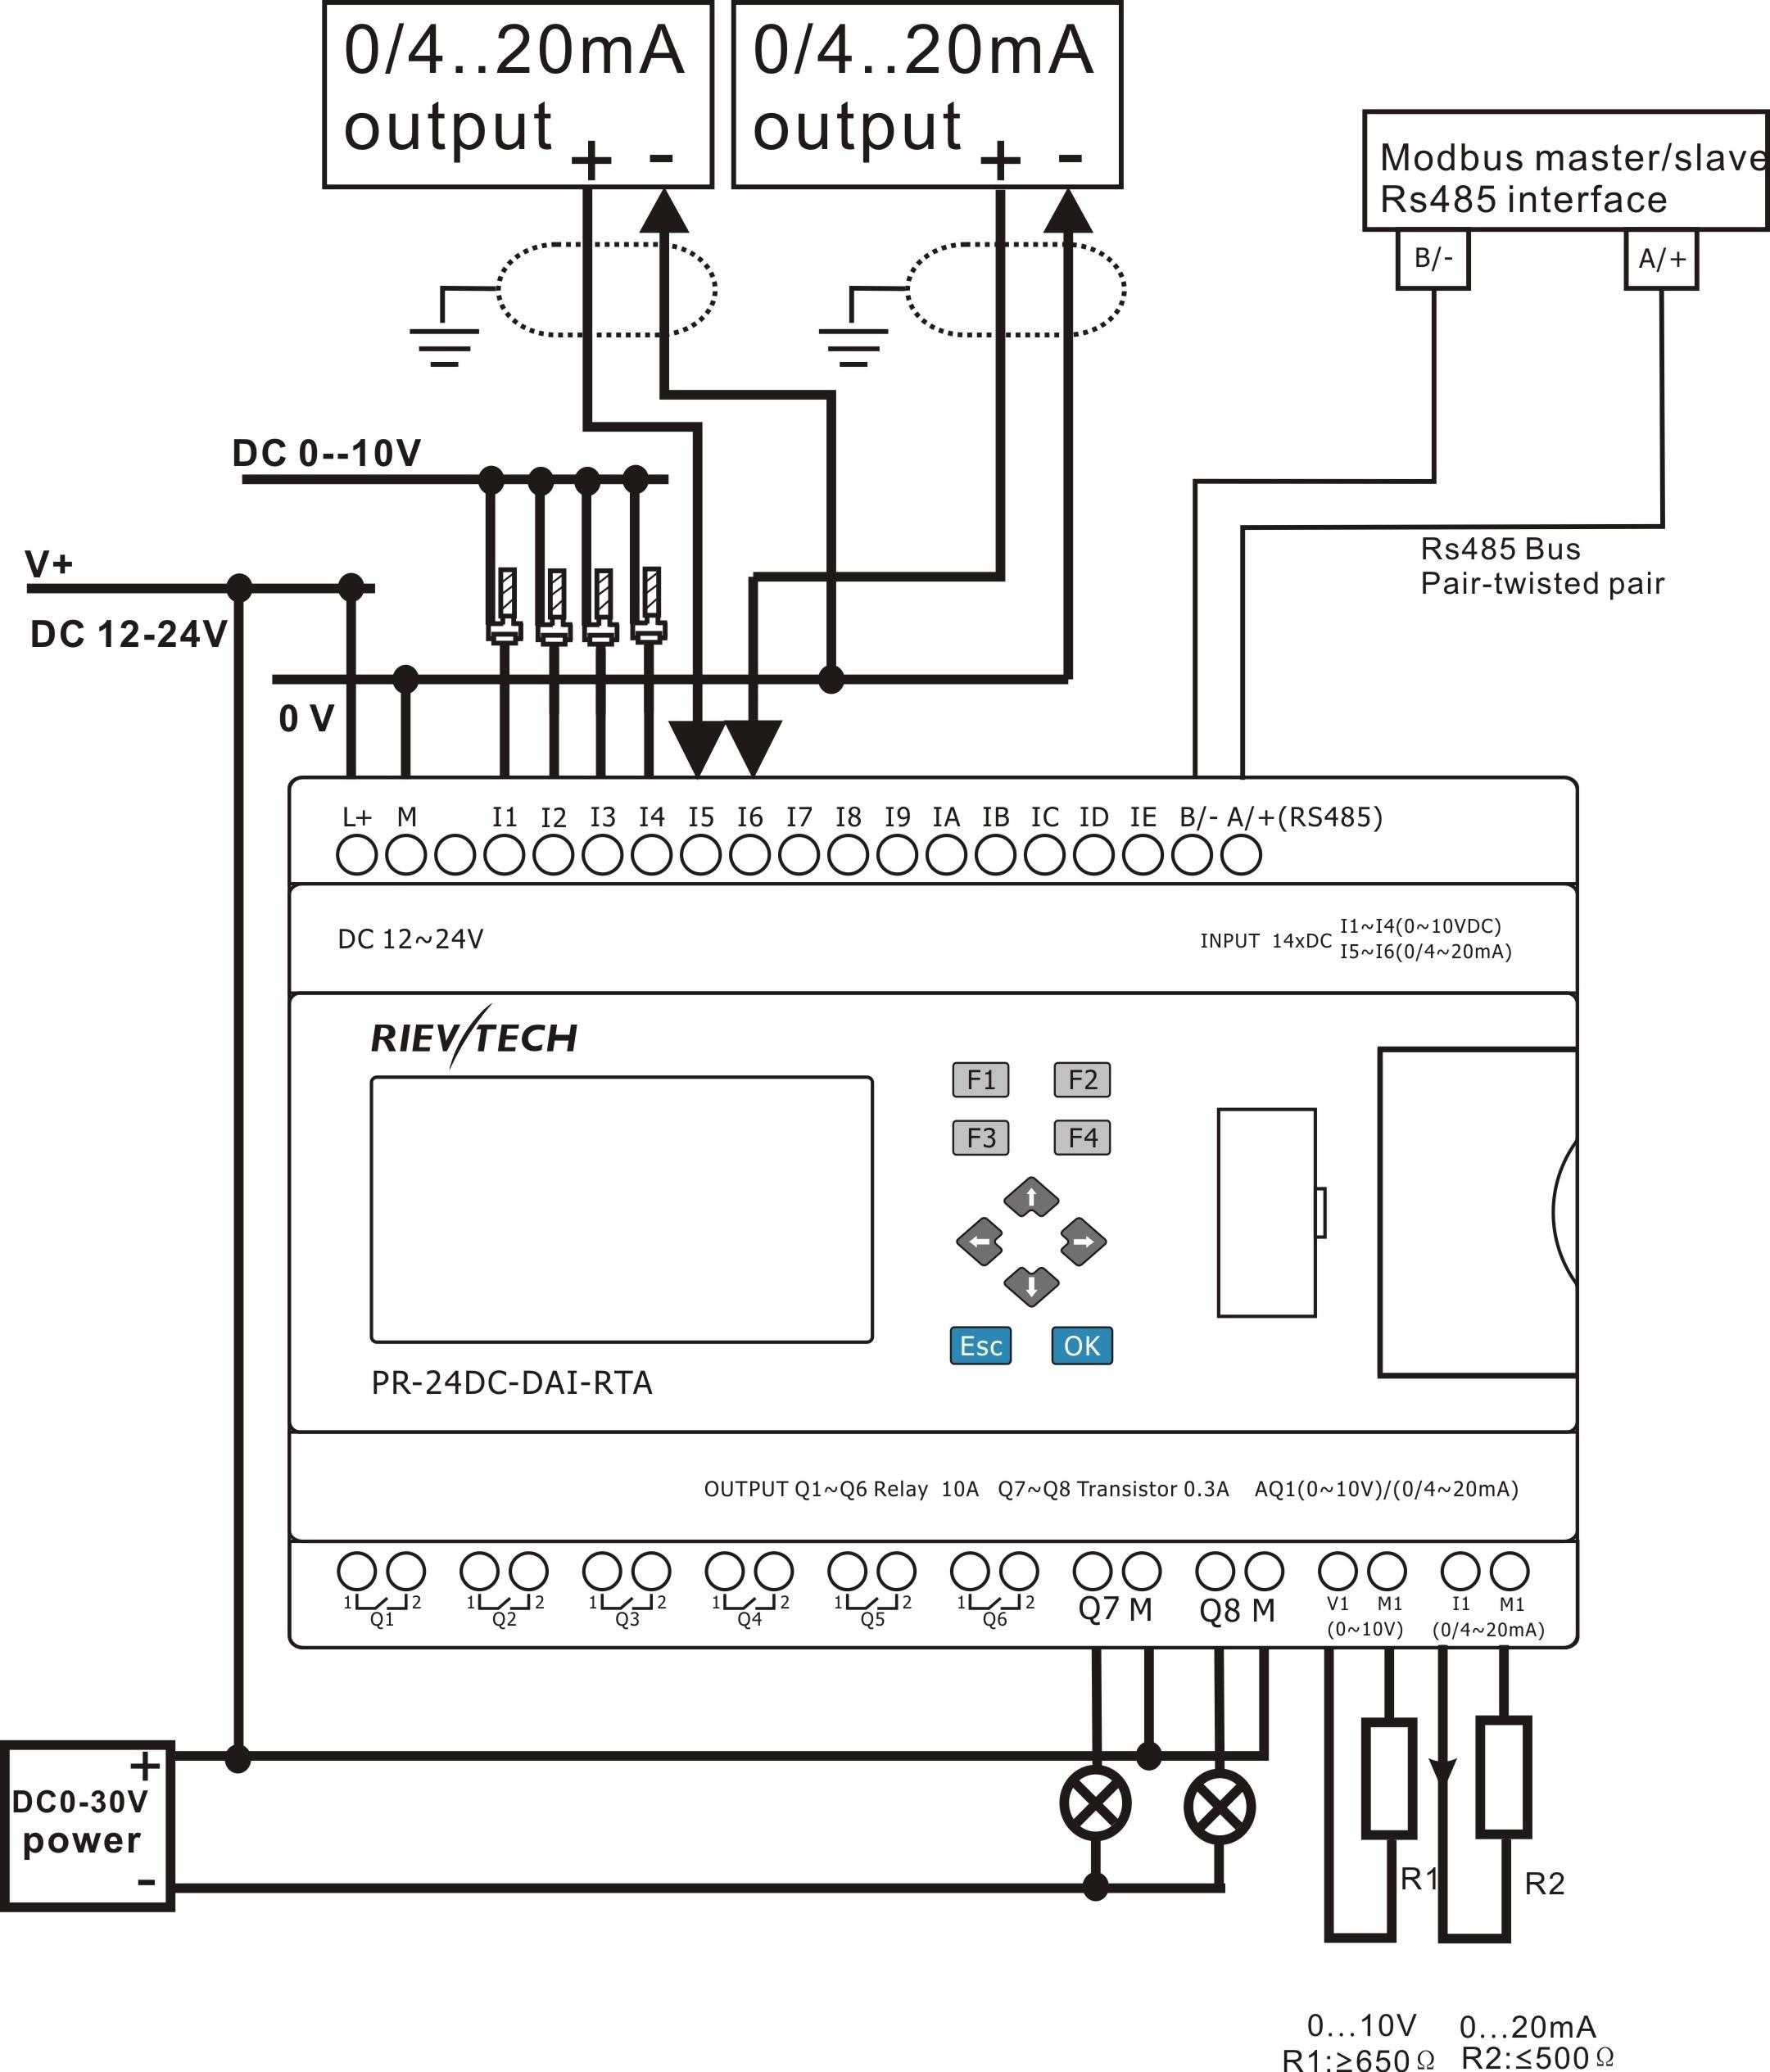 3 Wire Hps Ballast Diagram | Wiring Library - Metal Halide Ballast Wiring Diagram